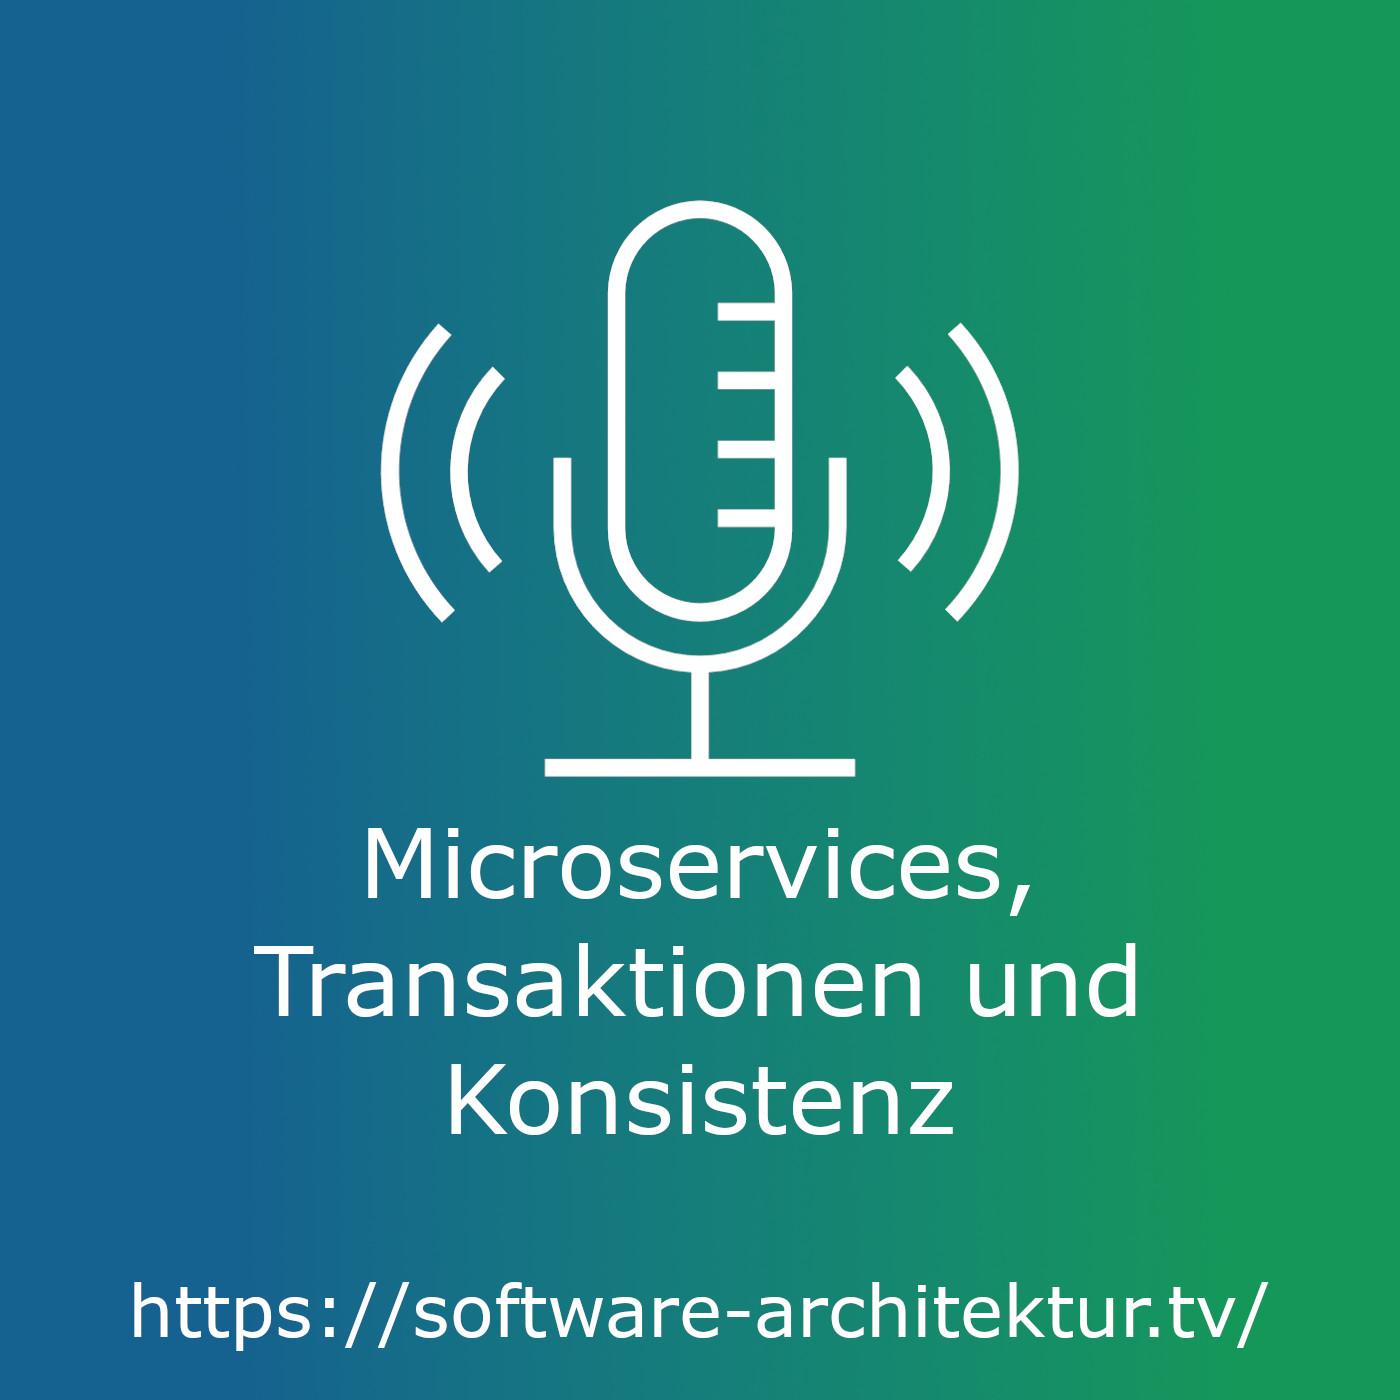 Microservices, Transaktionen & Konsistenz